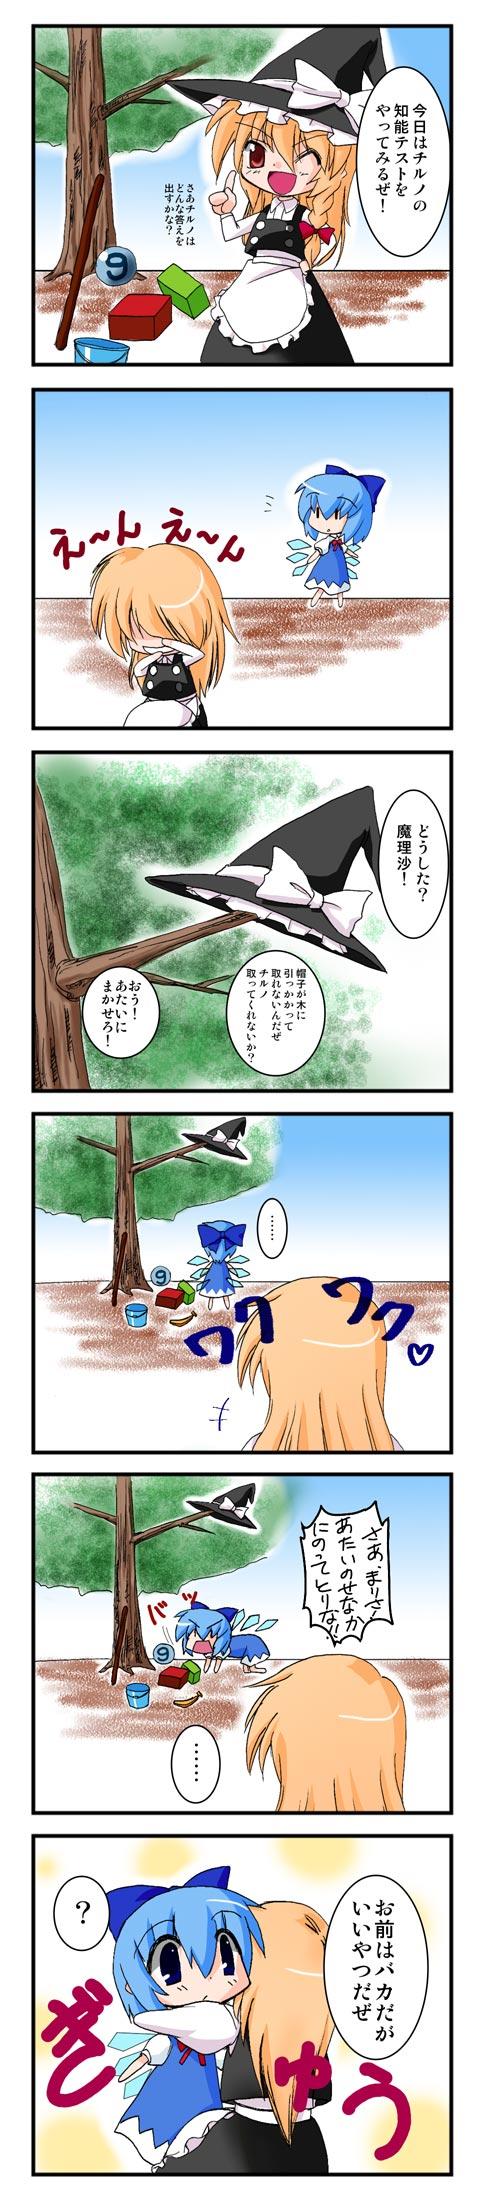 cirno and kirisame marisa (touhou) drawn by sugina fujitaka